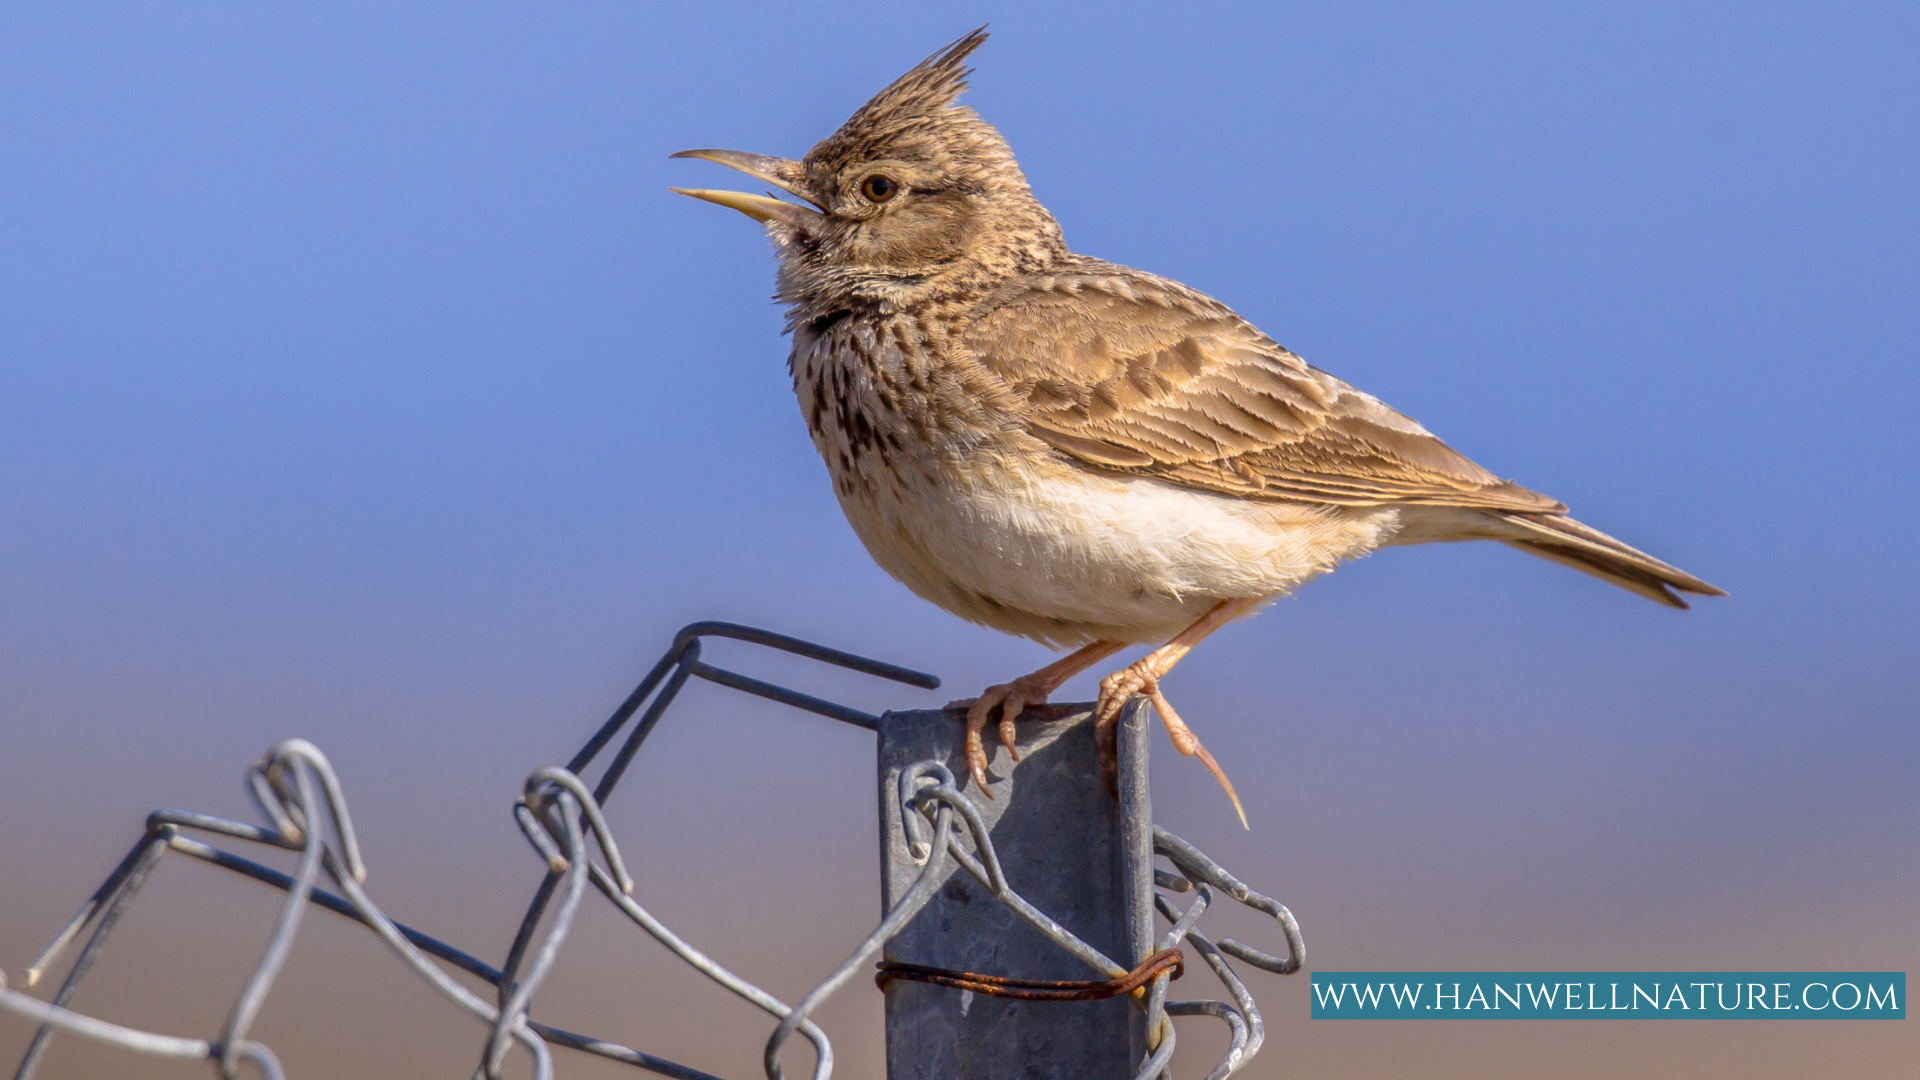 Skylark on chain fence